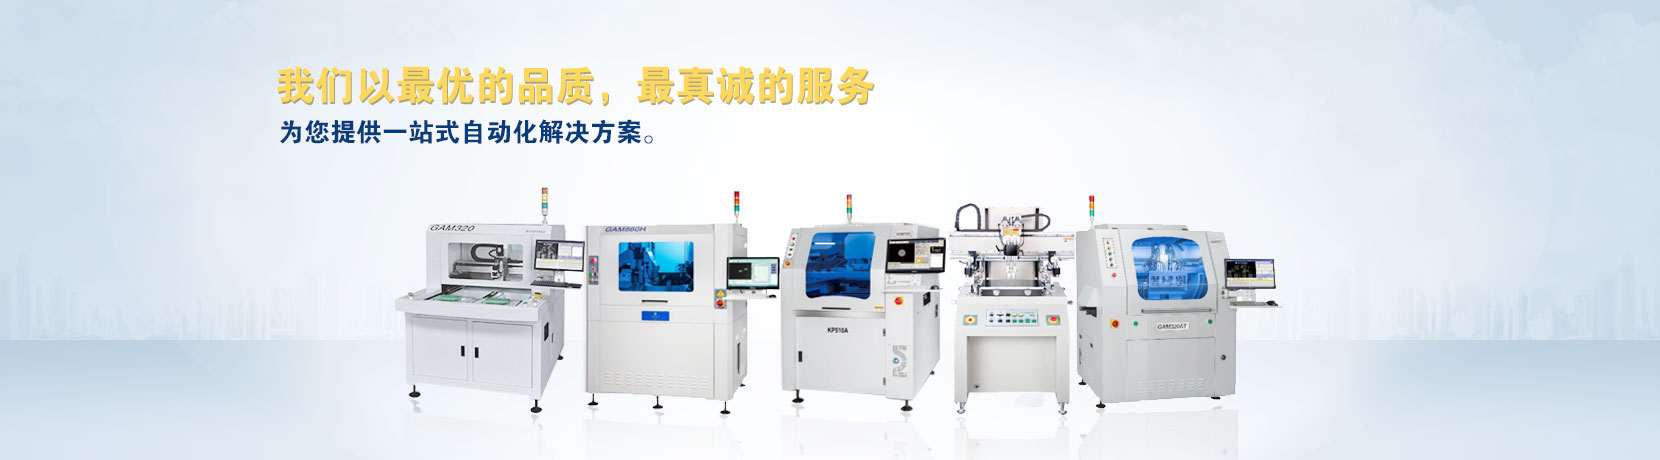 智茂全自动PCB分板机厂家网站首页banner1